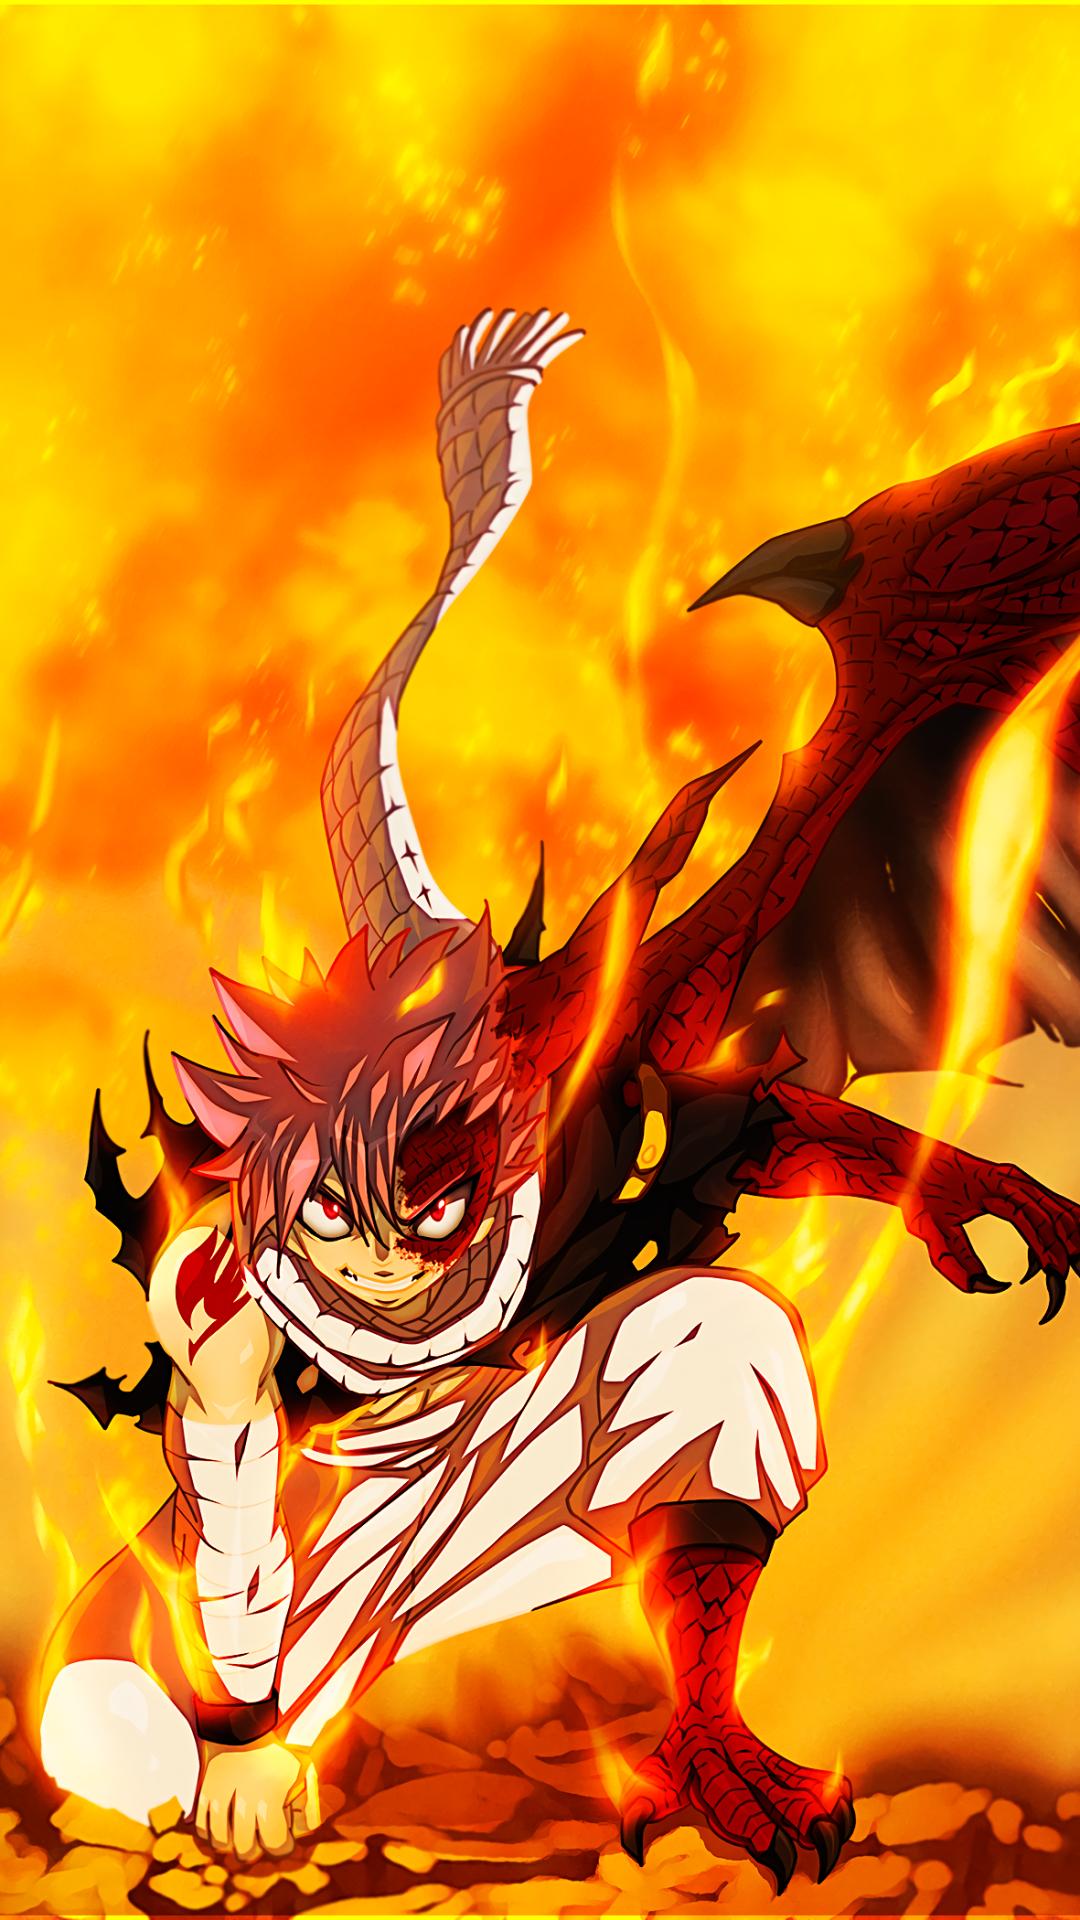 Anime Fairy Tail Natsu Dragneel Fire Mobile Wallpaper Animacoes De Contos De Fada Fairy Tail Lucy Nalu Fairy Tail